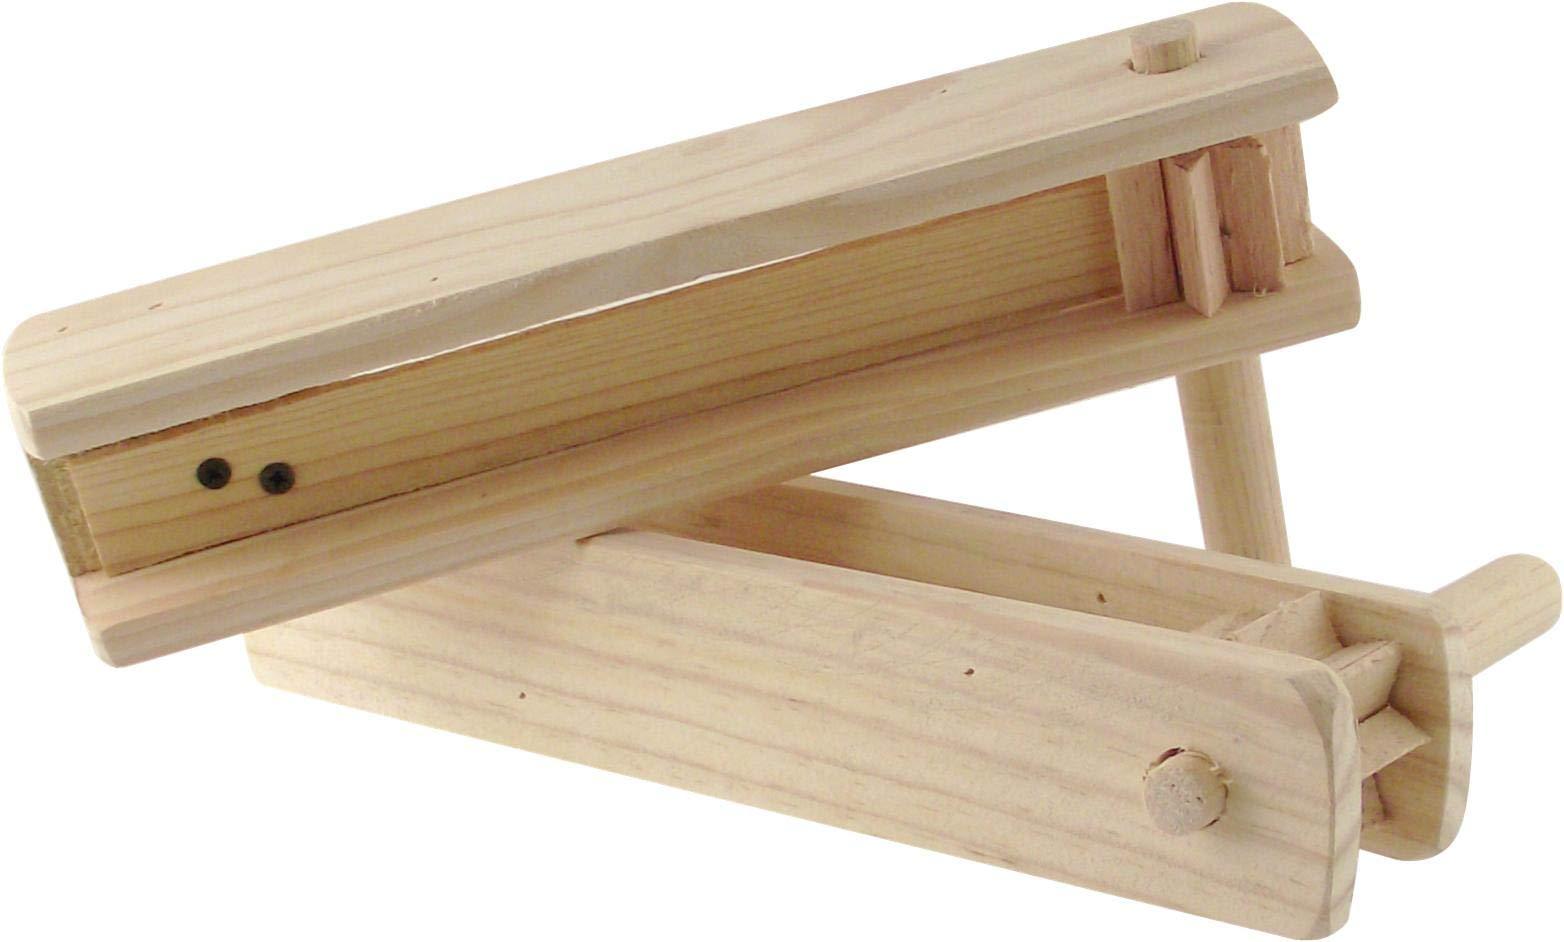 2 Large Wooden Matraca Noisemaker - Two 11'' Ratchet by MoreFiesta